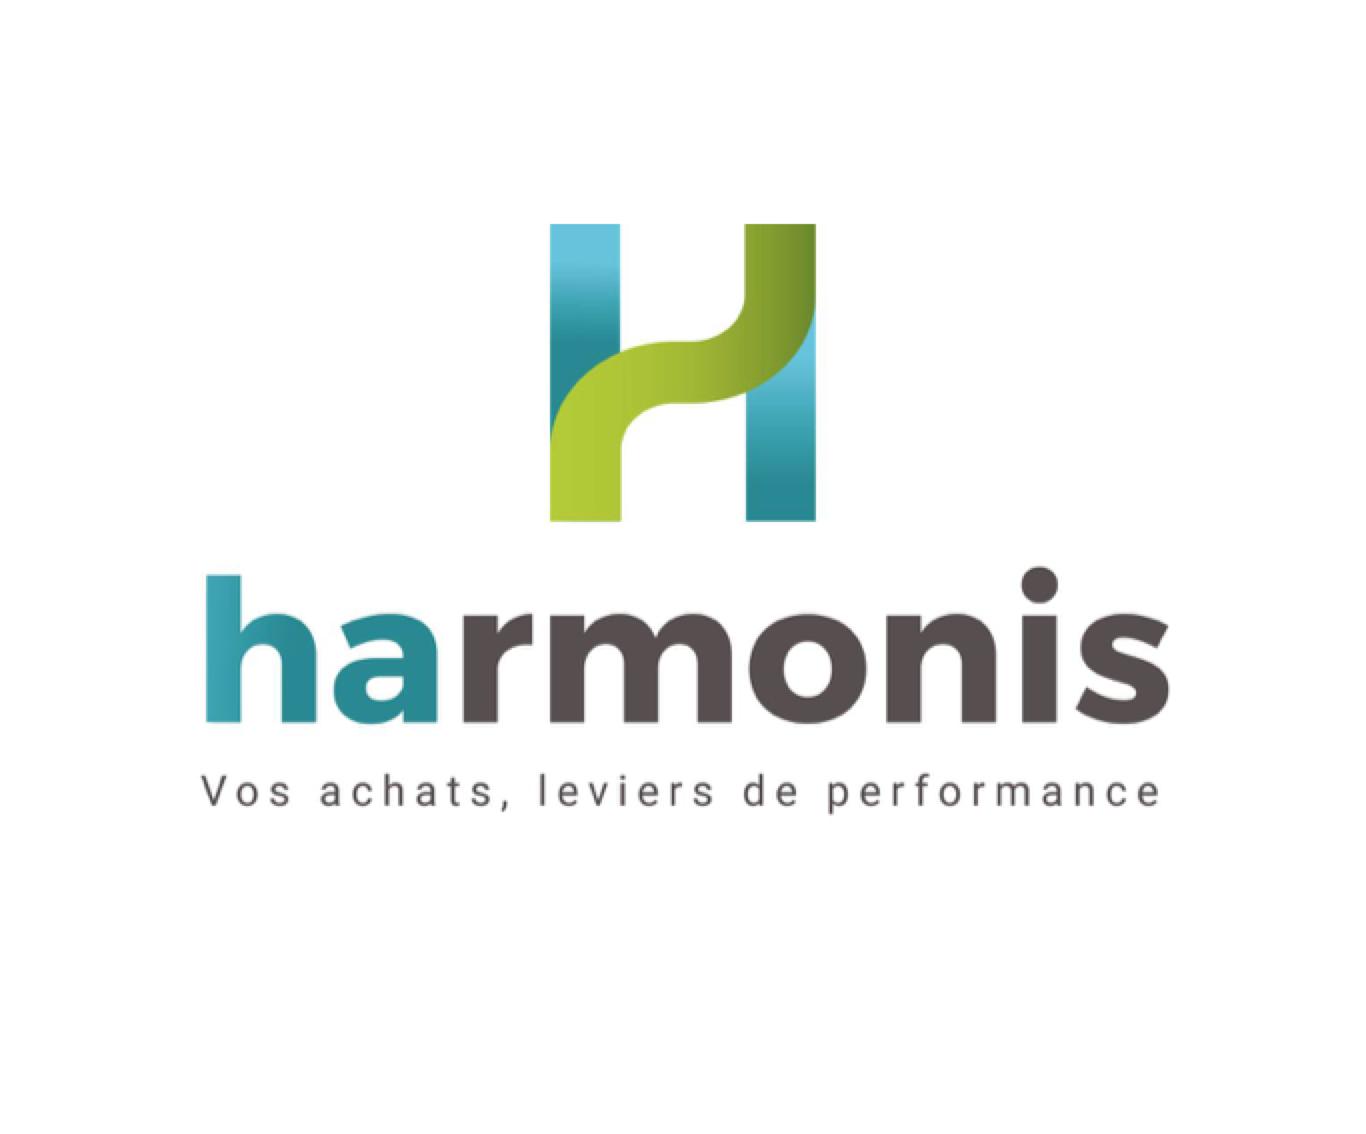 Harmonyis com